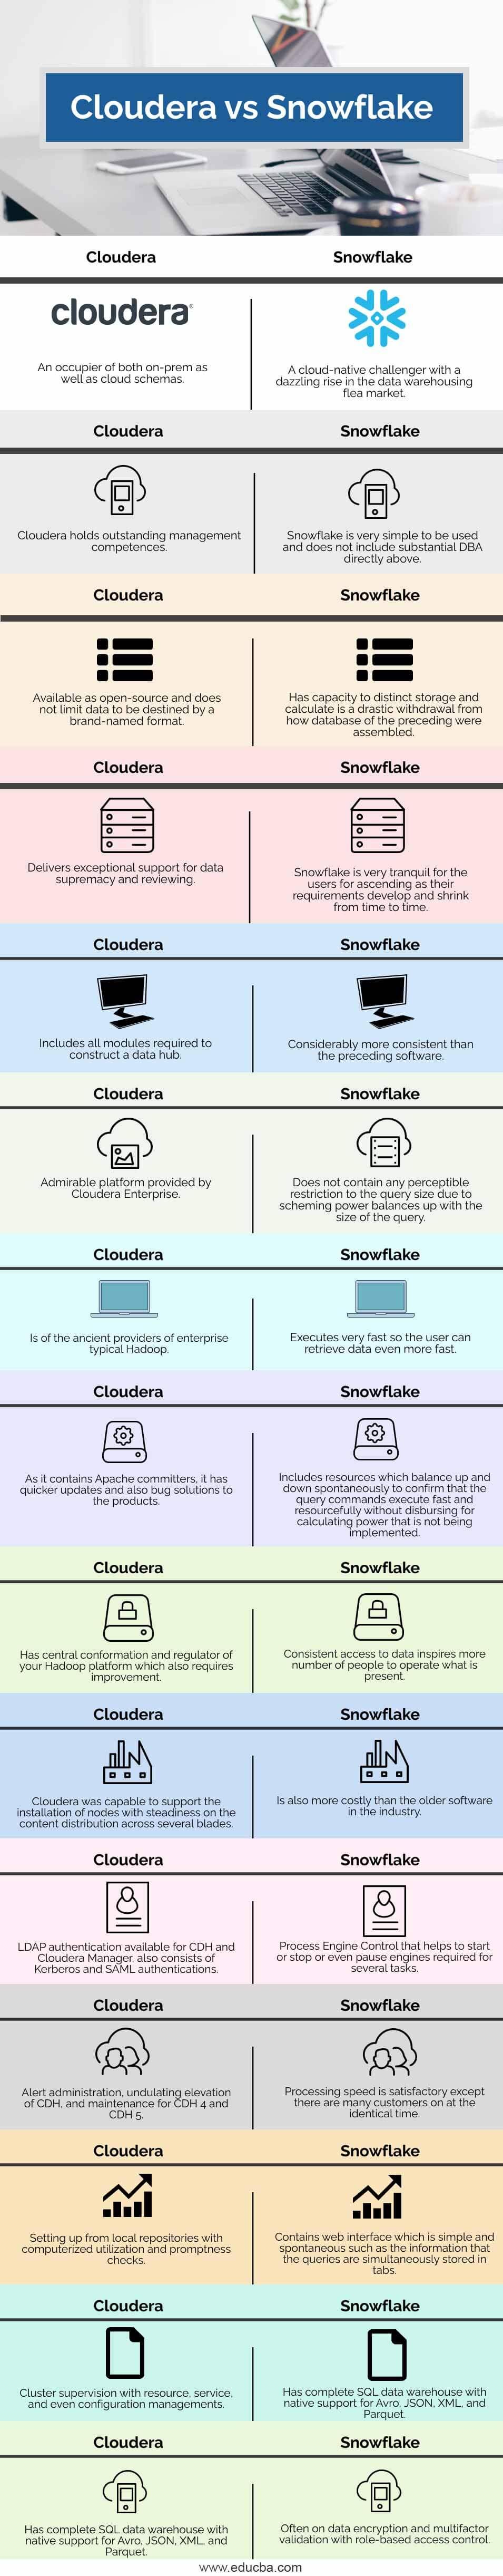 Cloudera-vs-Snowflake-info